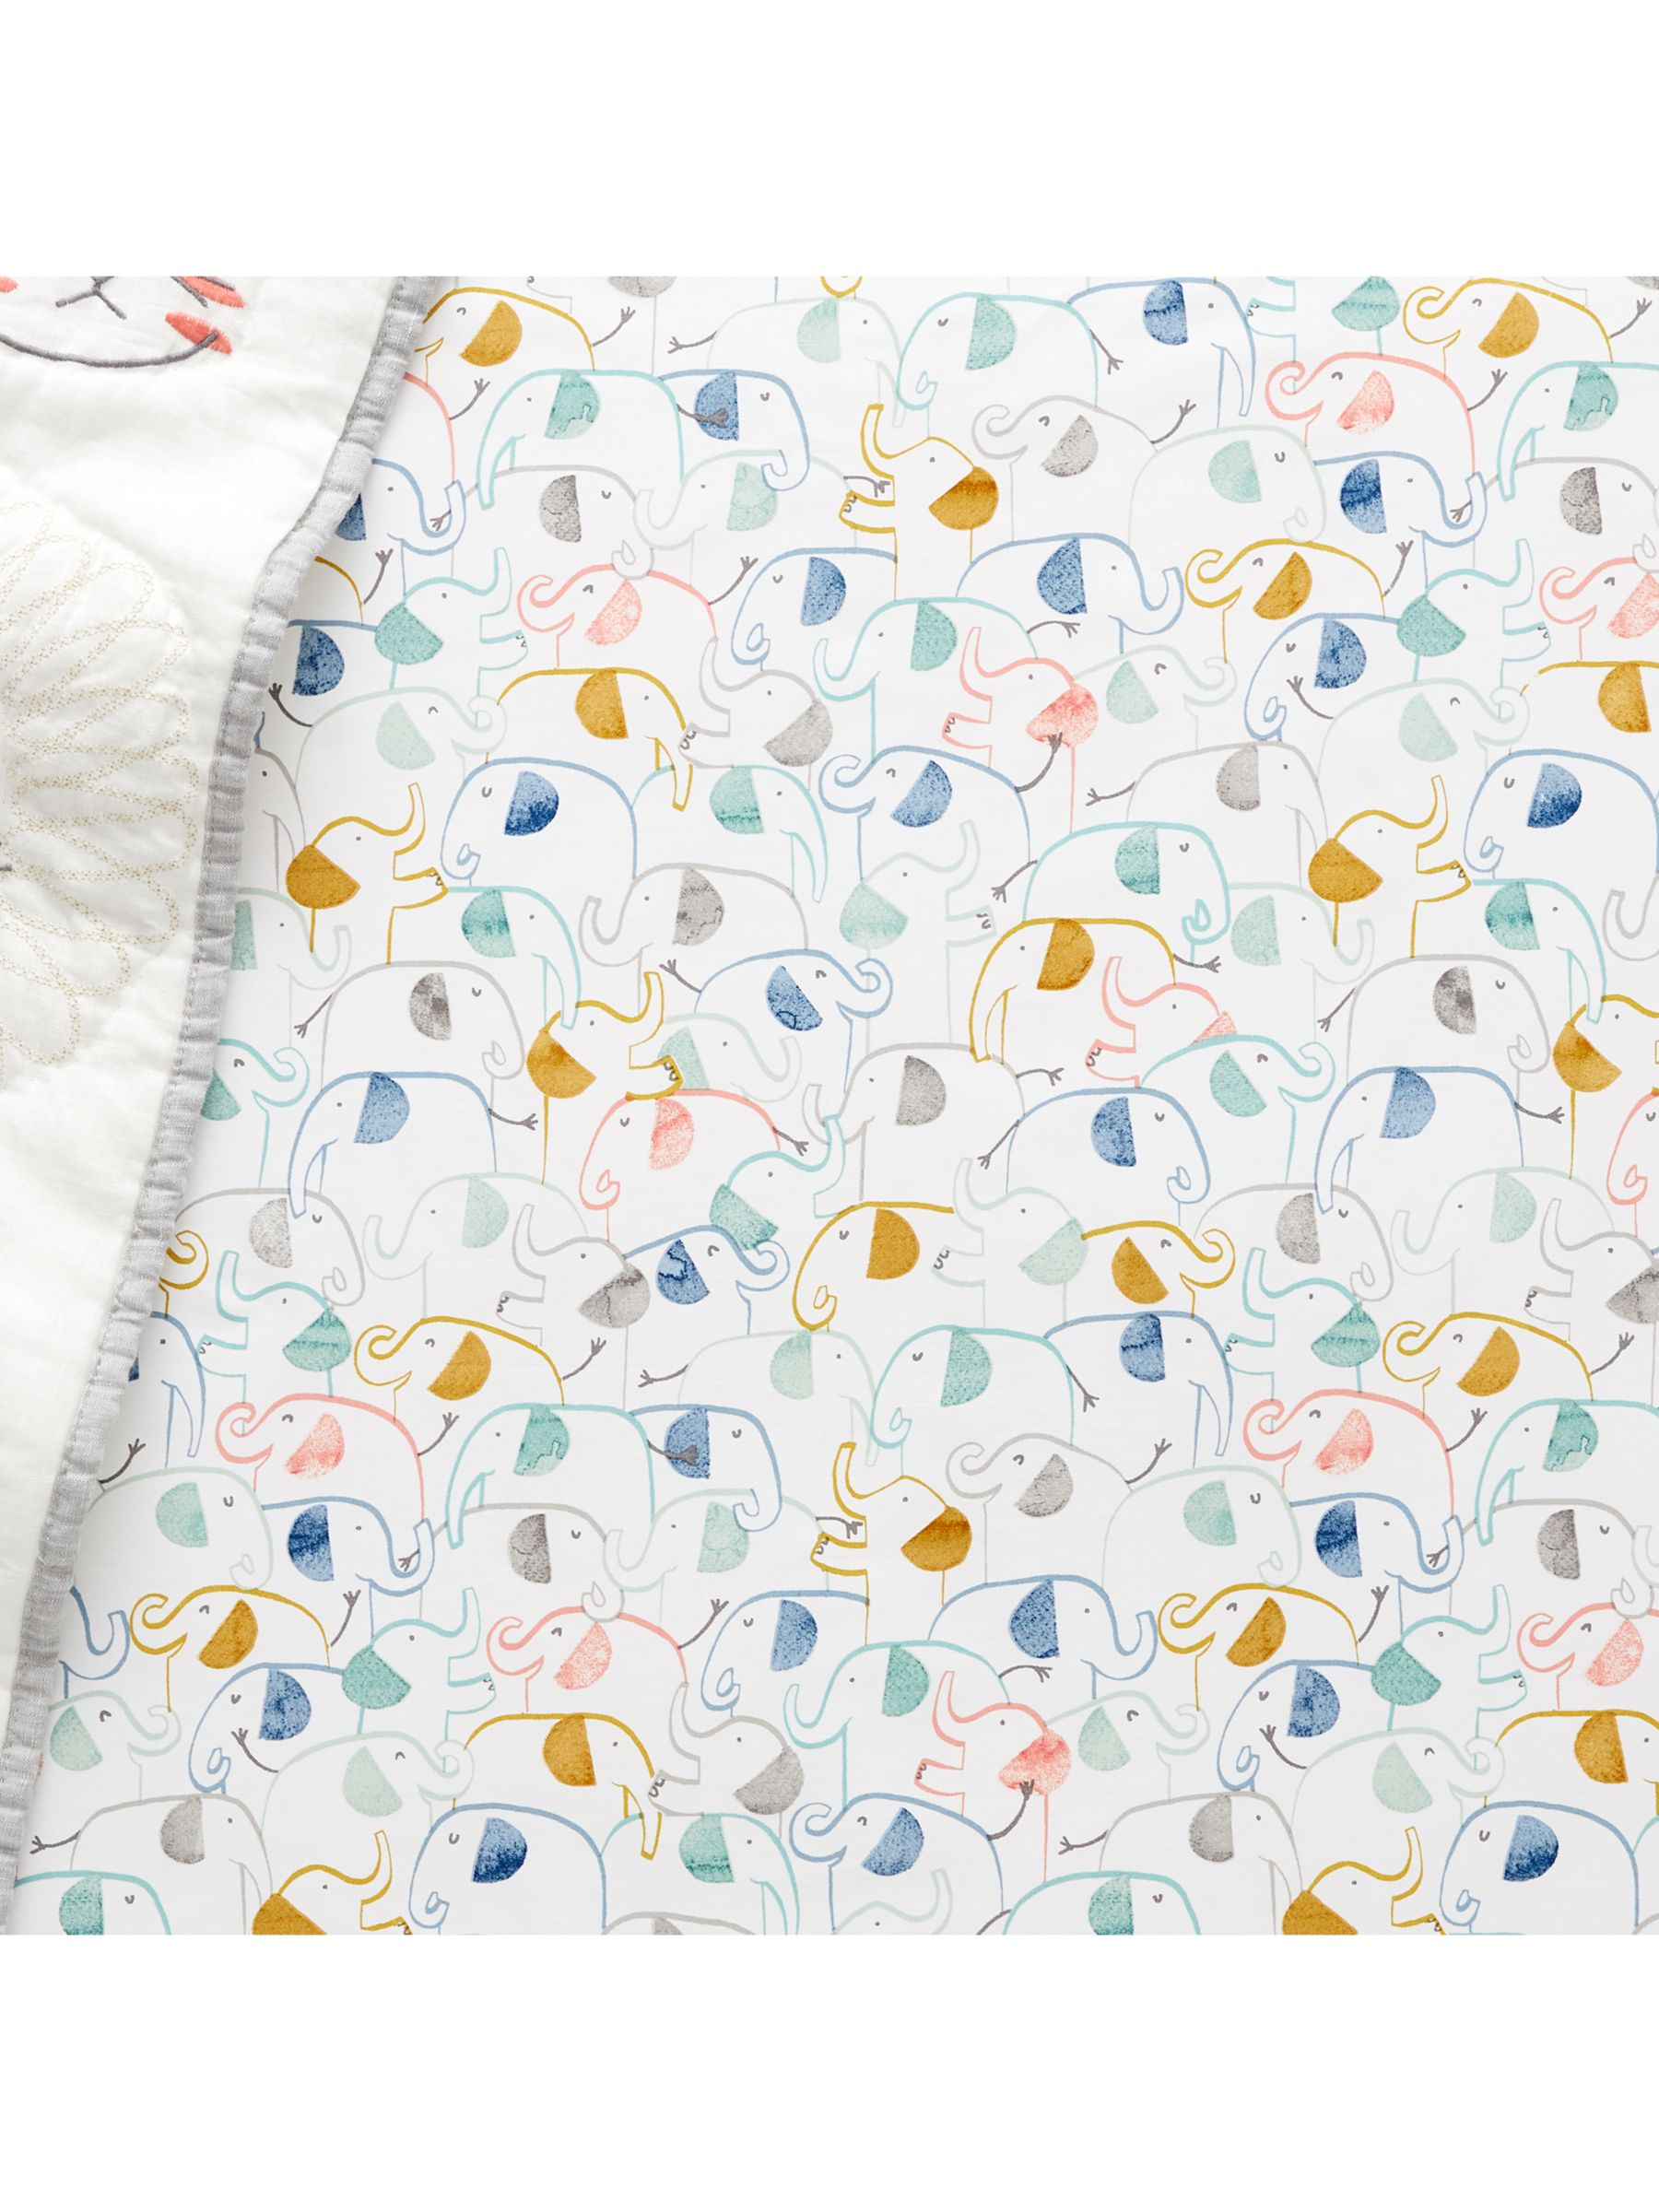 Pottery Barn Kids Organic Emery Elephant Print Fitted Cot Sheet, 70 x 132cm, Multi